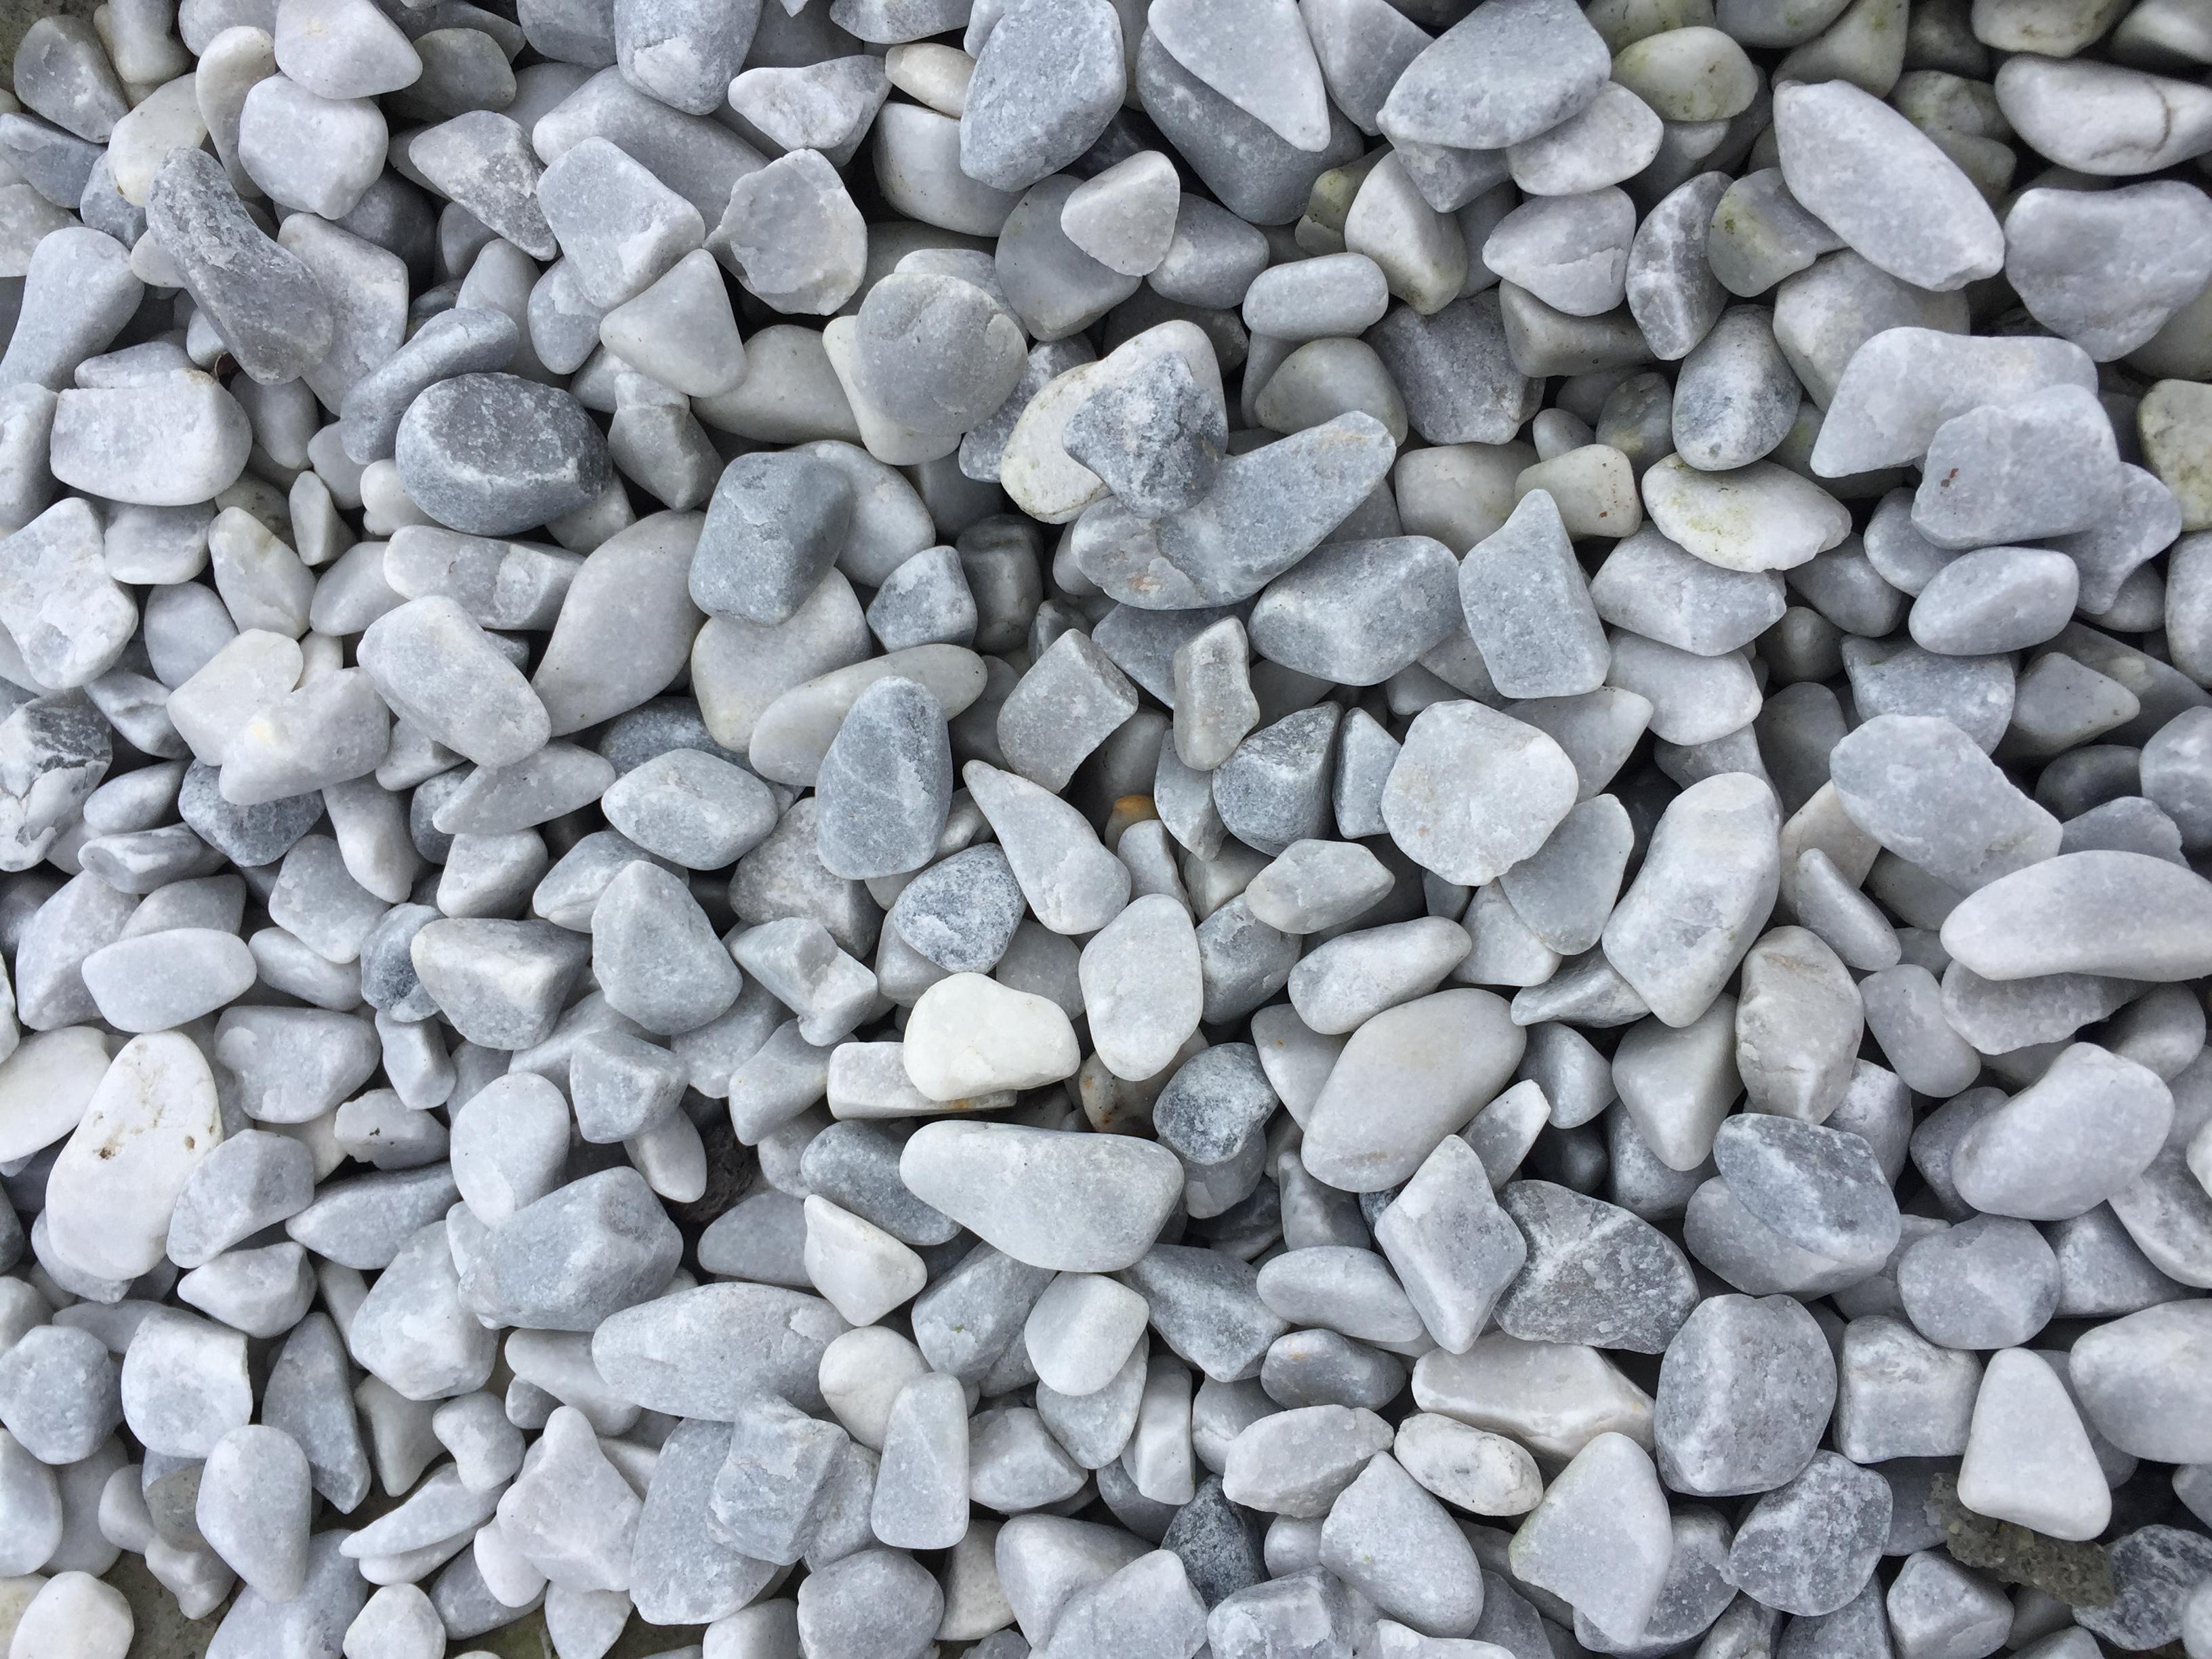 Galets gris/bleu - AMG Matériaux